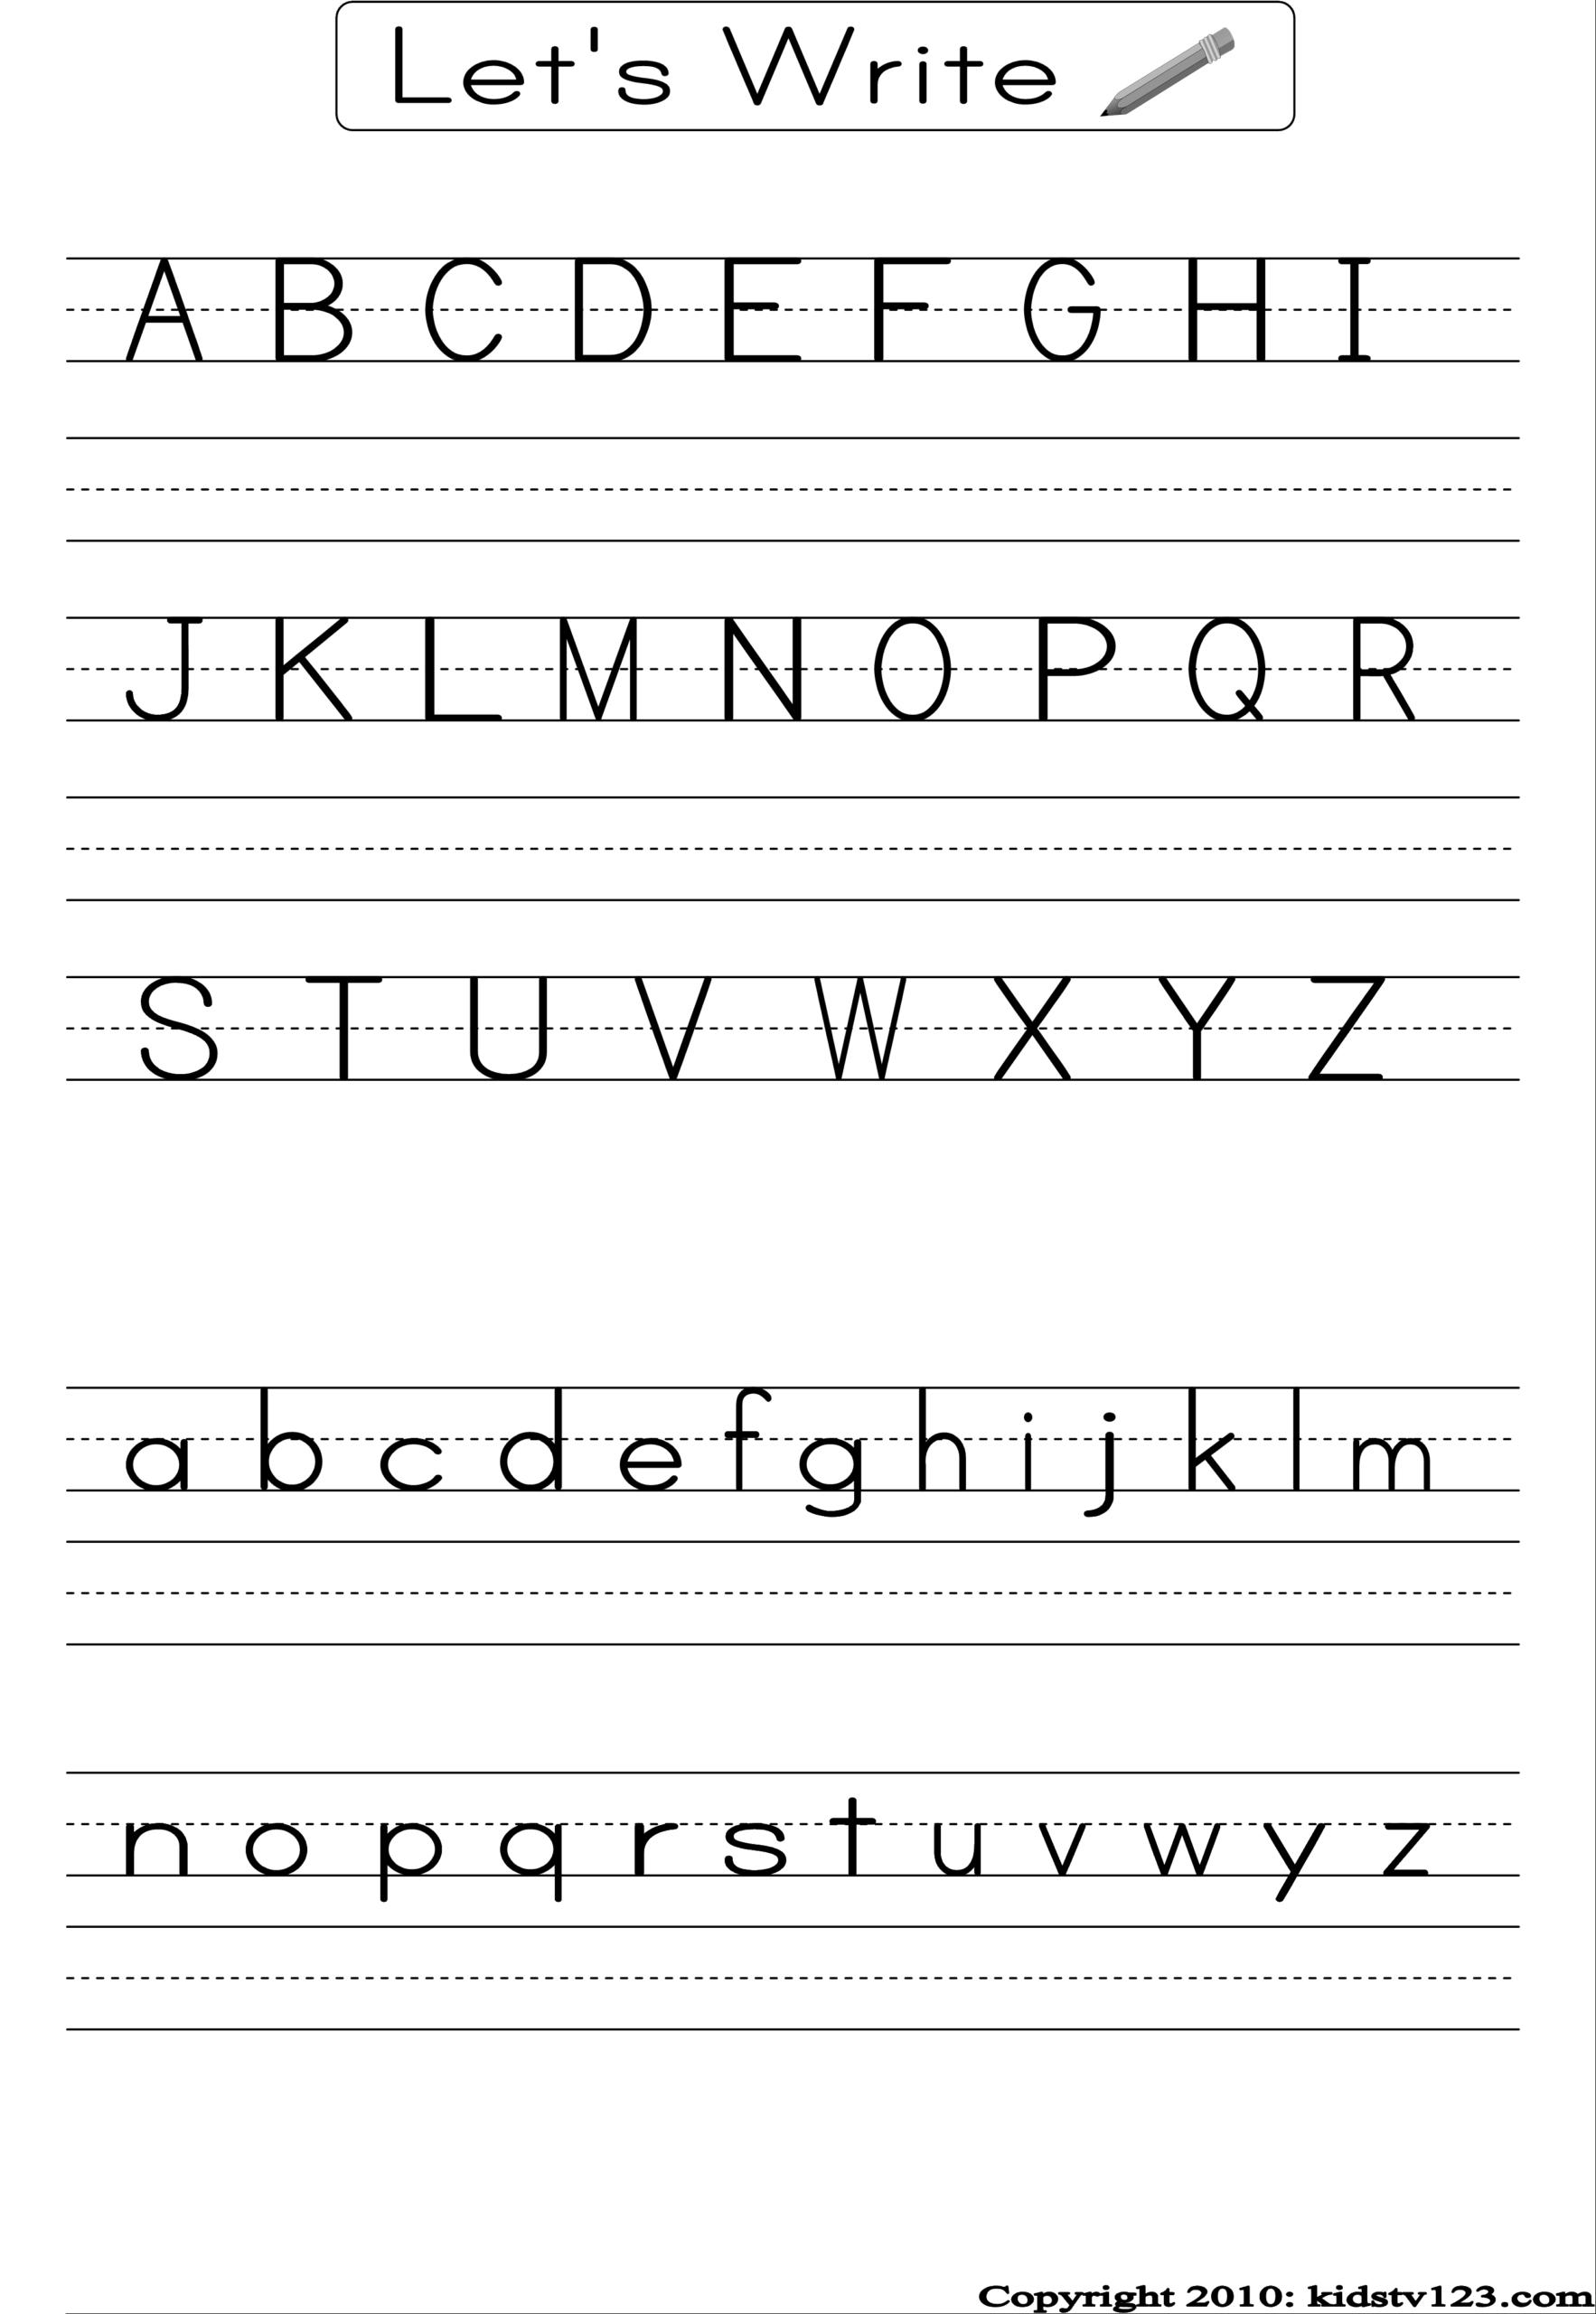 Alphabet Writing Practice Sheet | Alphabet Writing Practice inside 4 Line Alphabet Worksheets